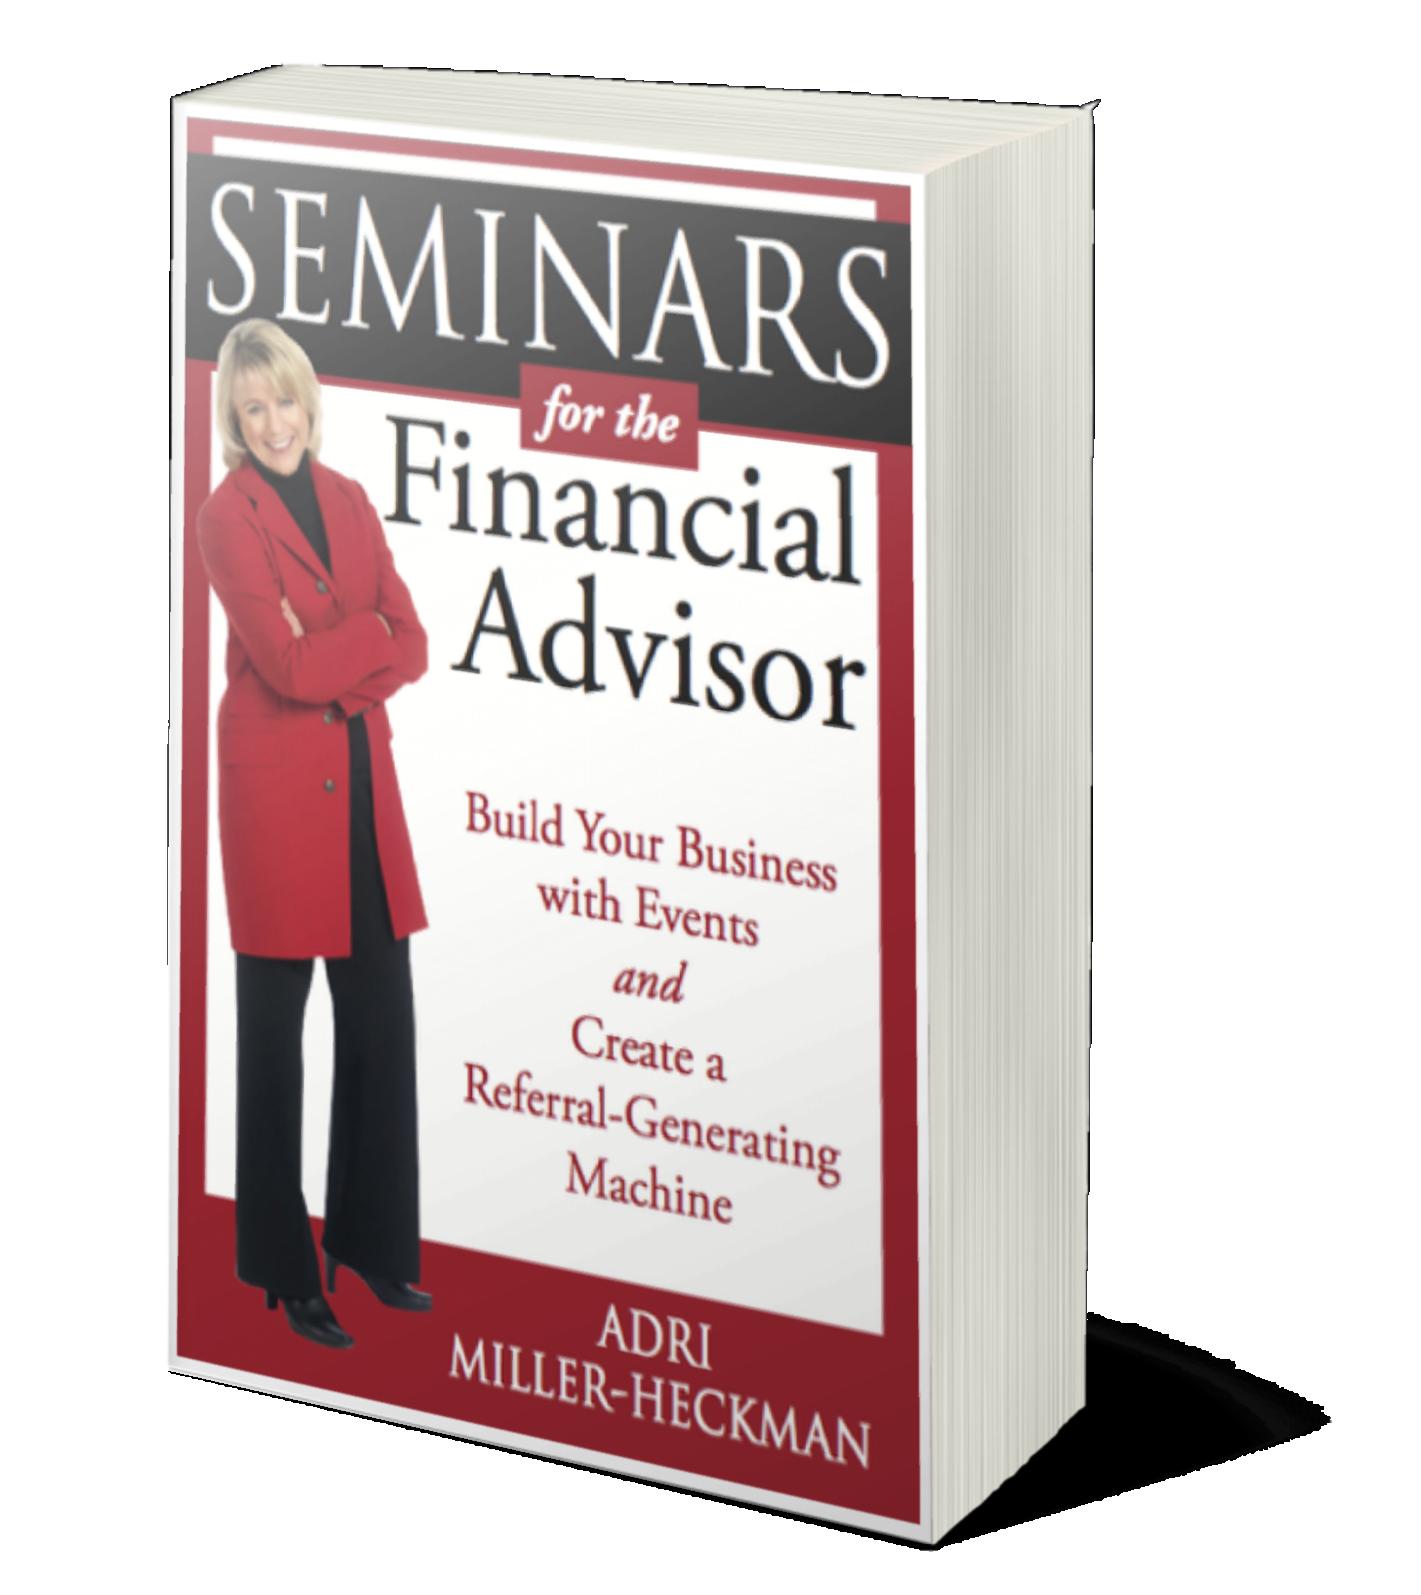 Seminars for the Financial Advisor Book Cover